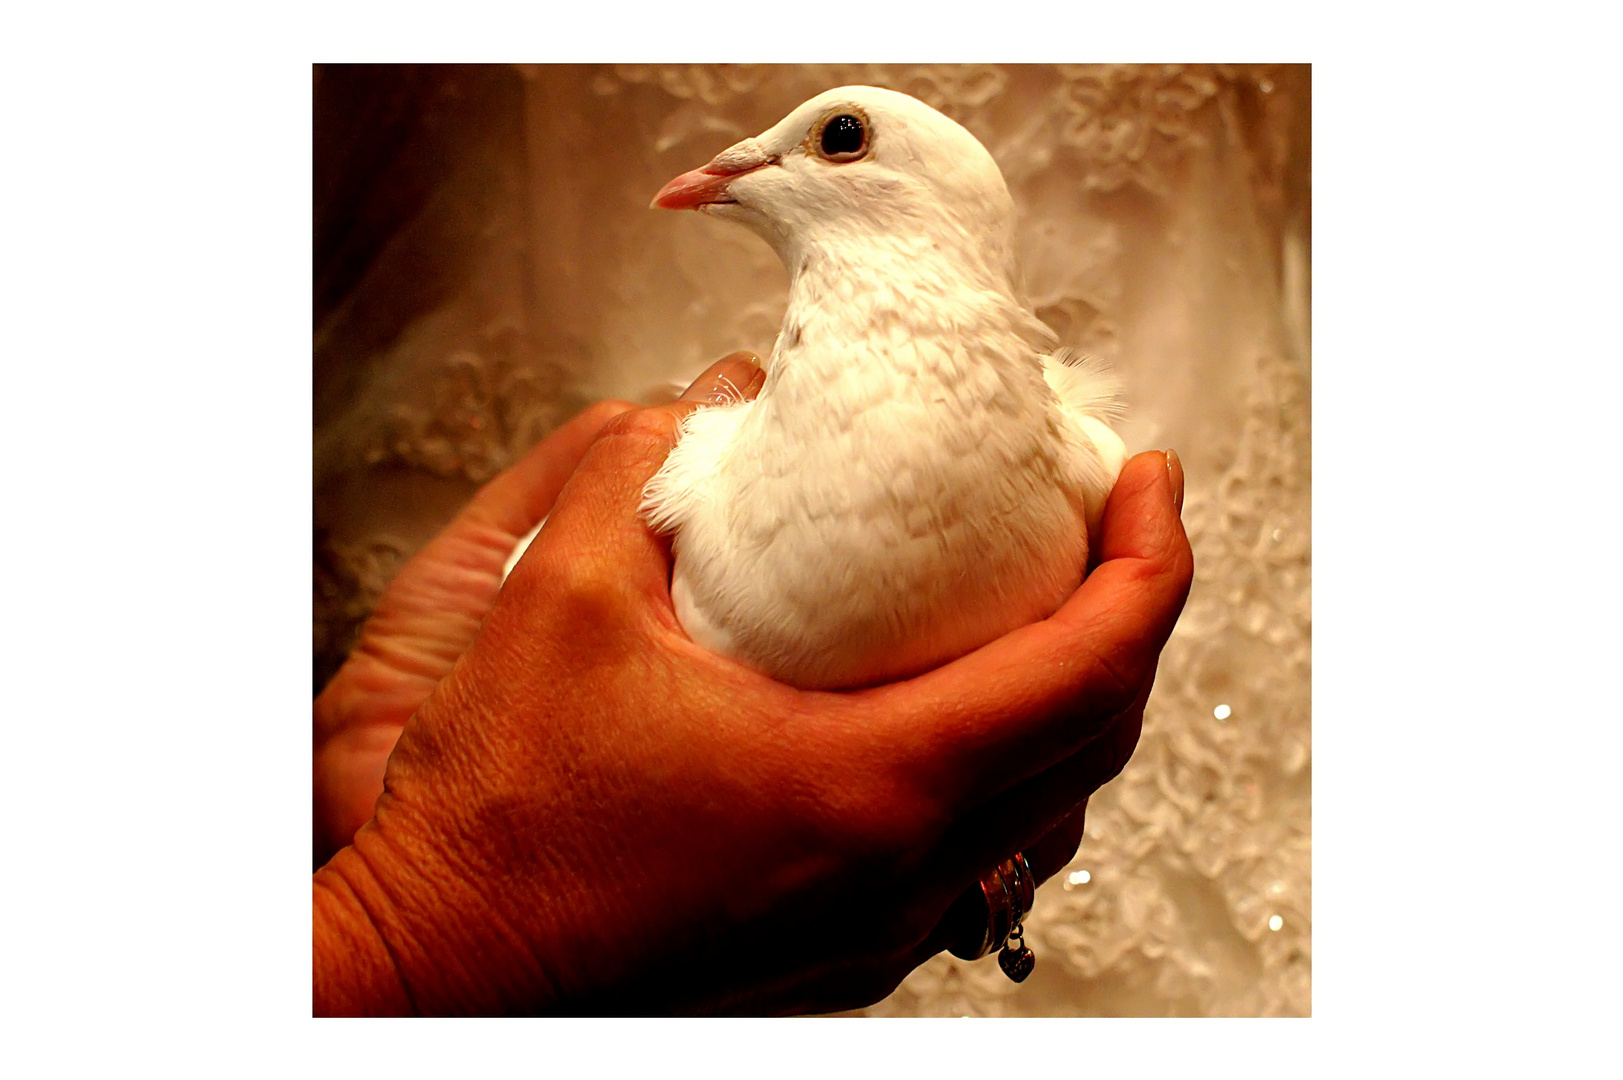 die weisse Taube